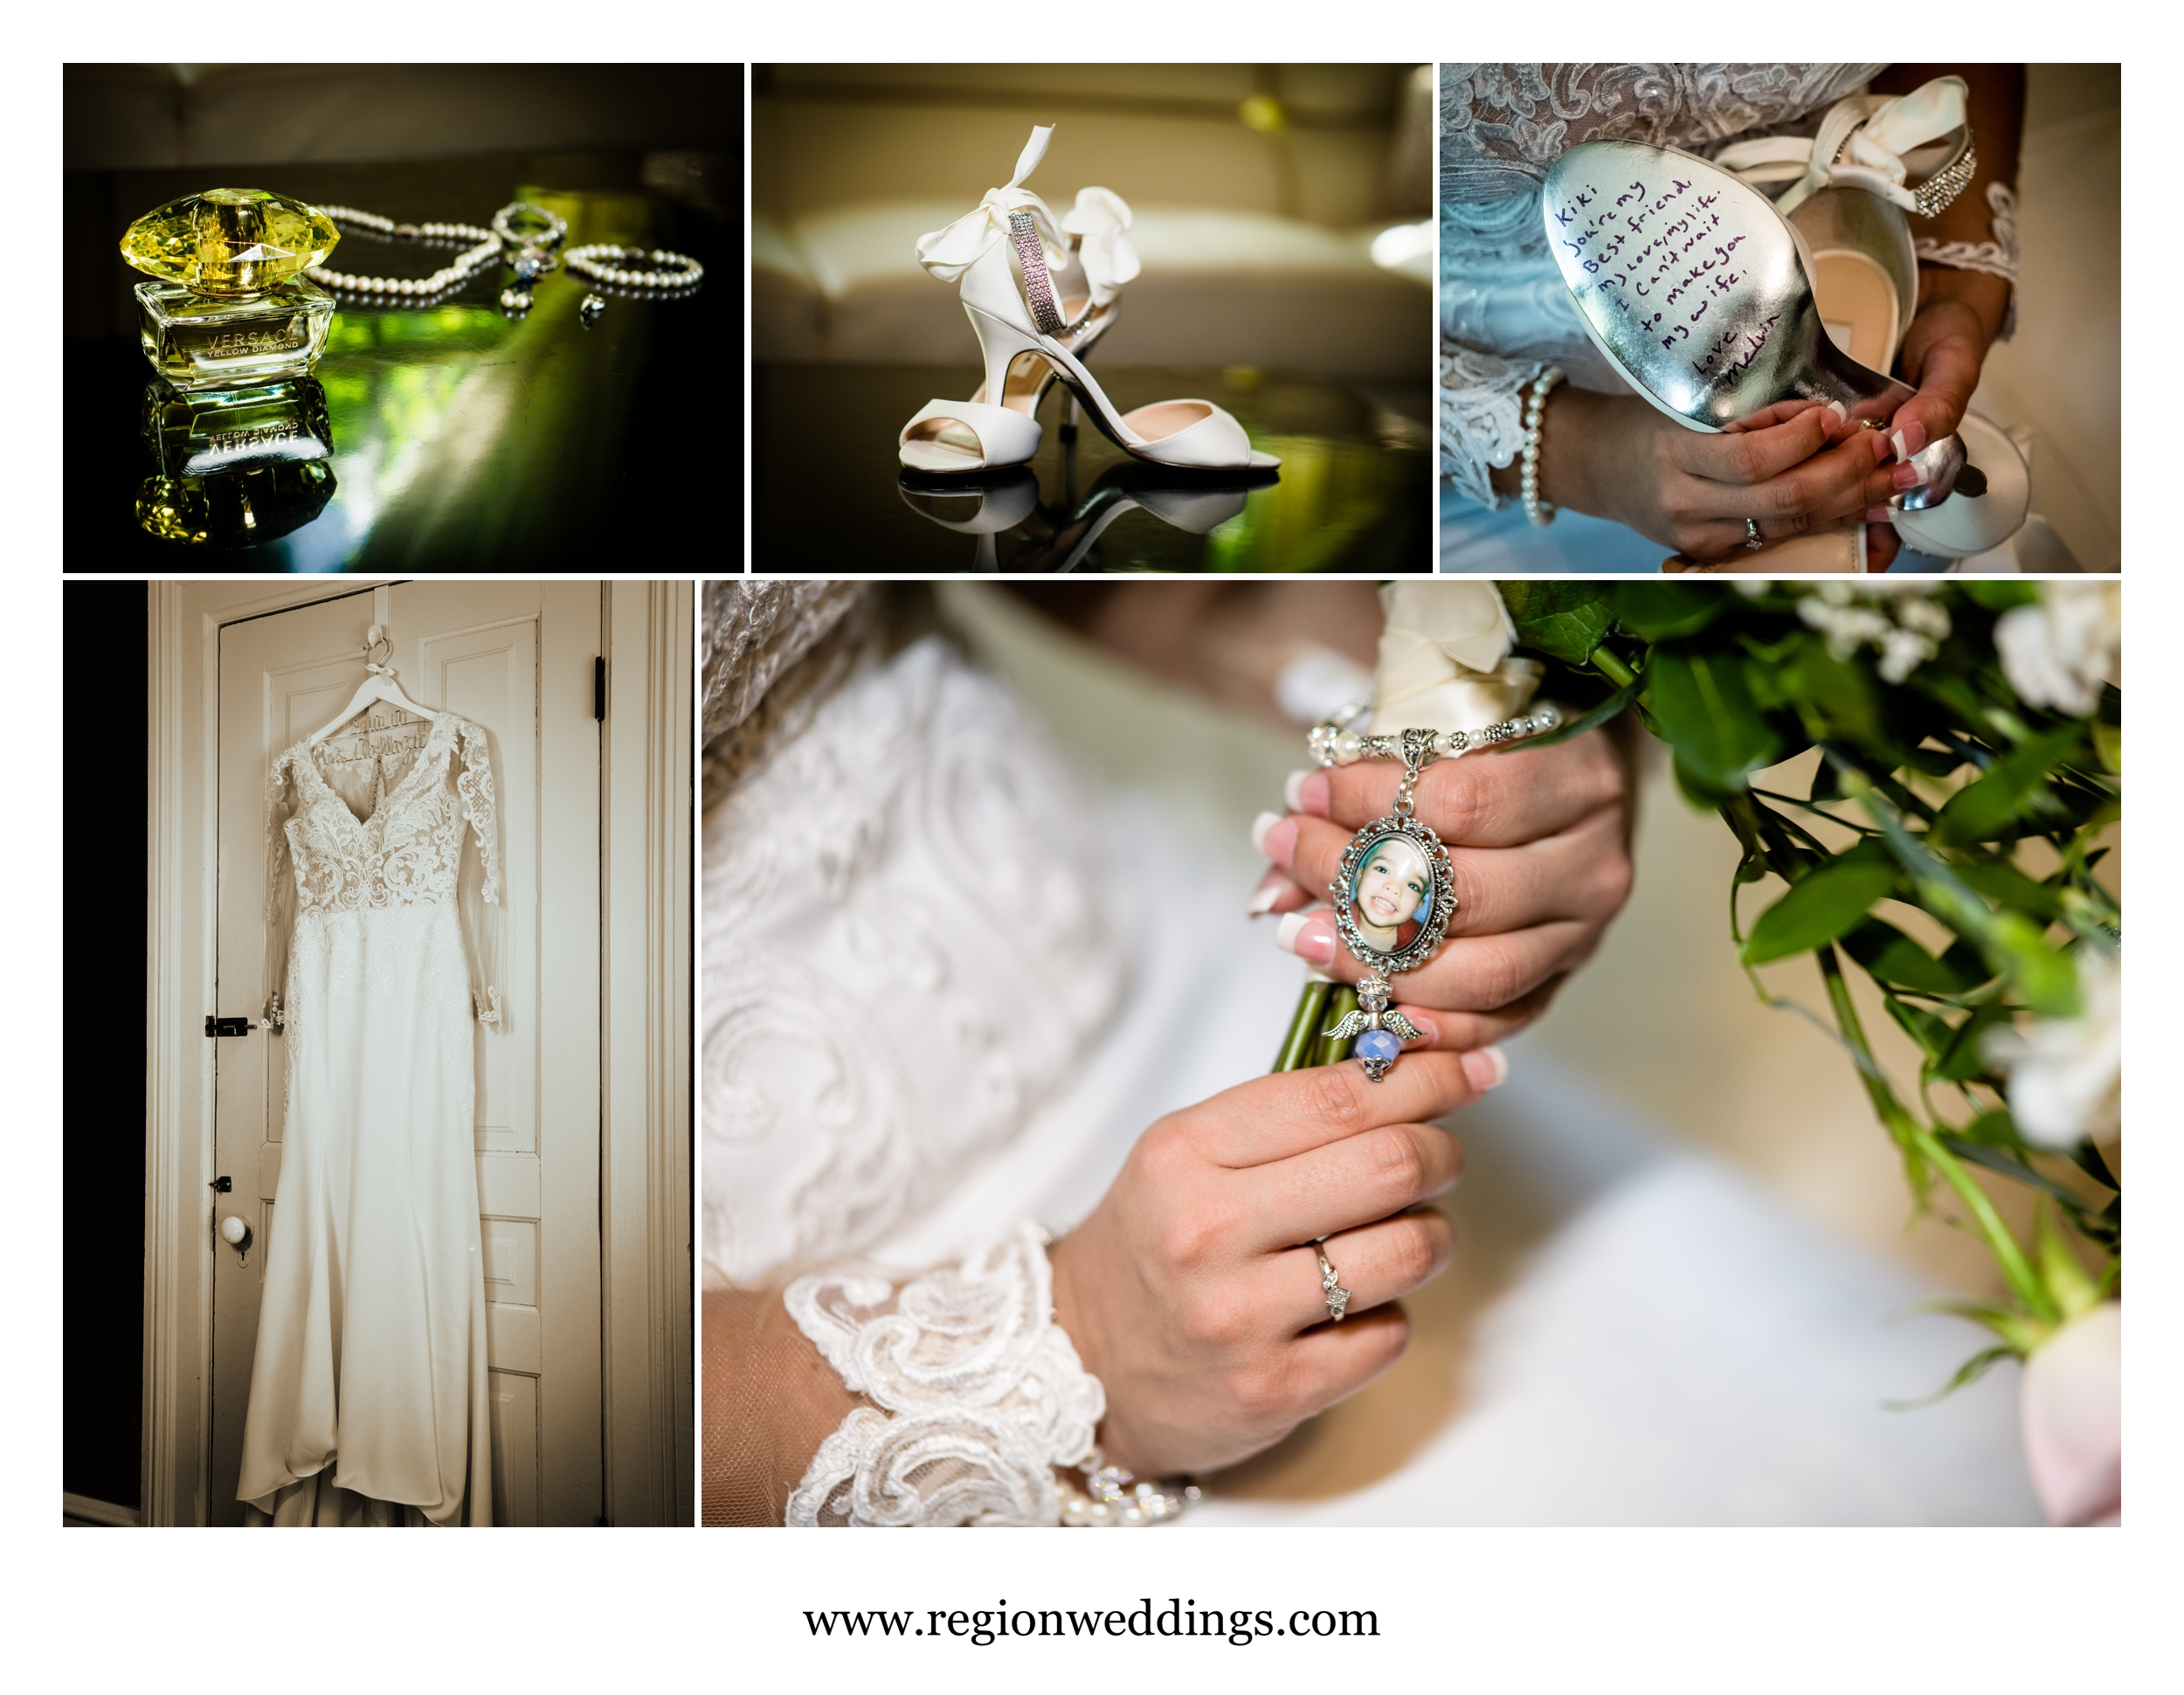 Bridal details at the Uptown Center bridal suite.